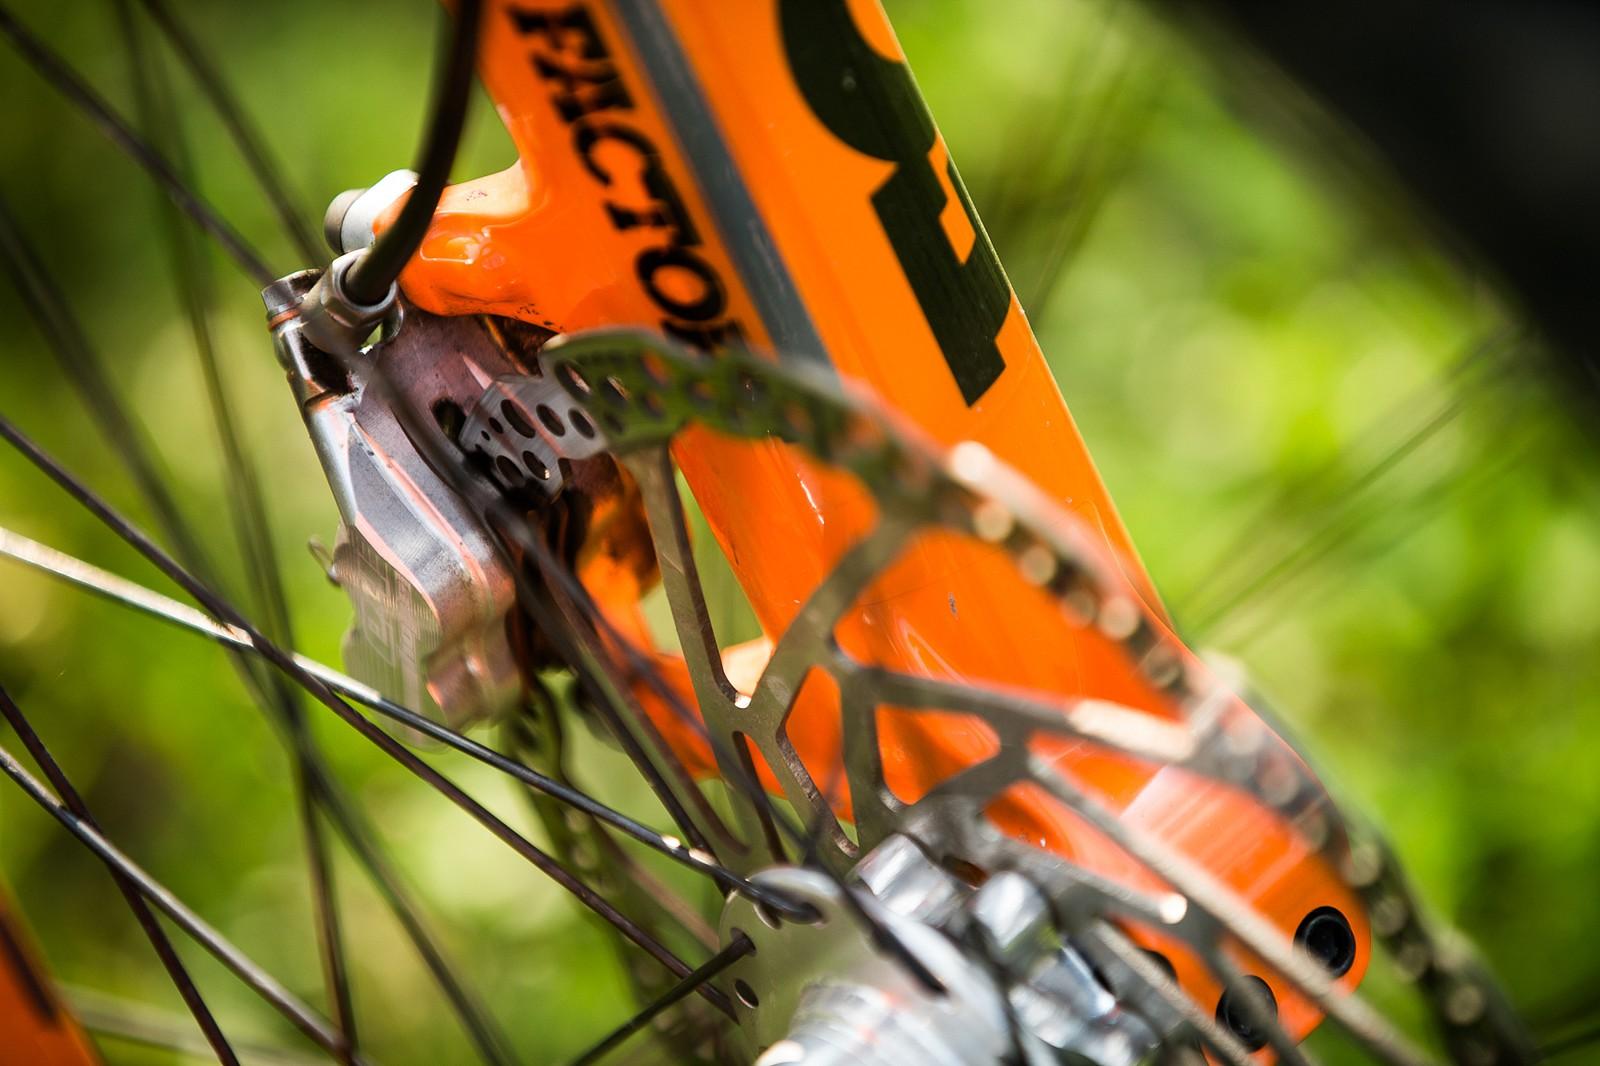 That Hope Goodness - Adam Brayton's Nukeproof Dissent with Prototype Hope Brakes - Mountain Biking Pictures - Vital MTB